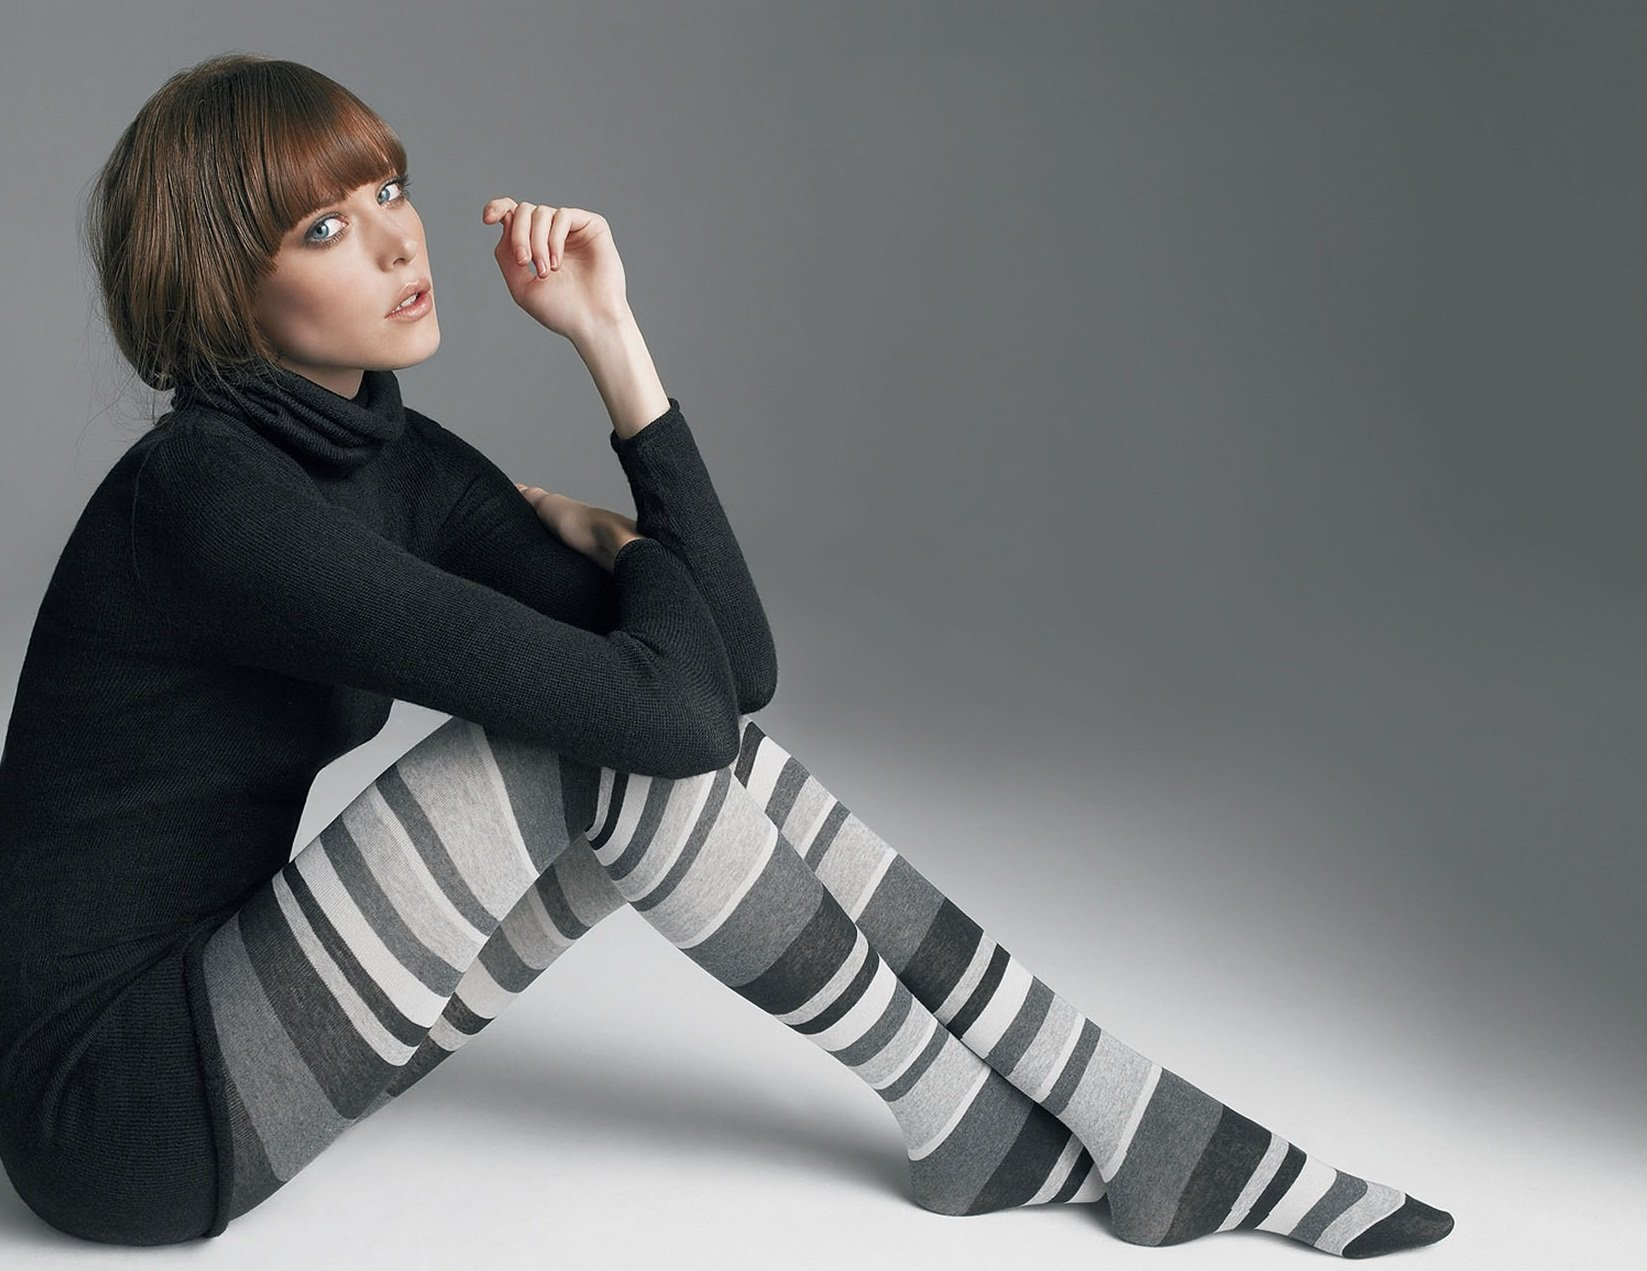 Long Legs Sexy Stockings wallpaper   ForWallpapercom 1647x1271